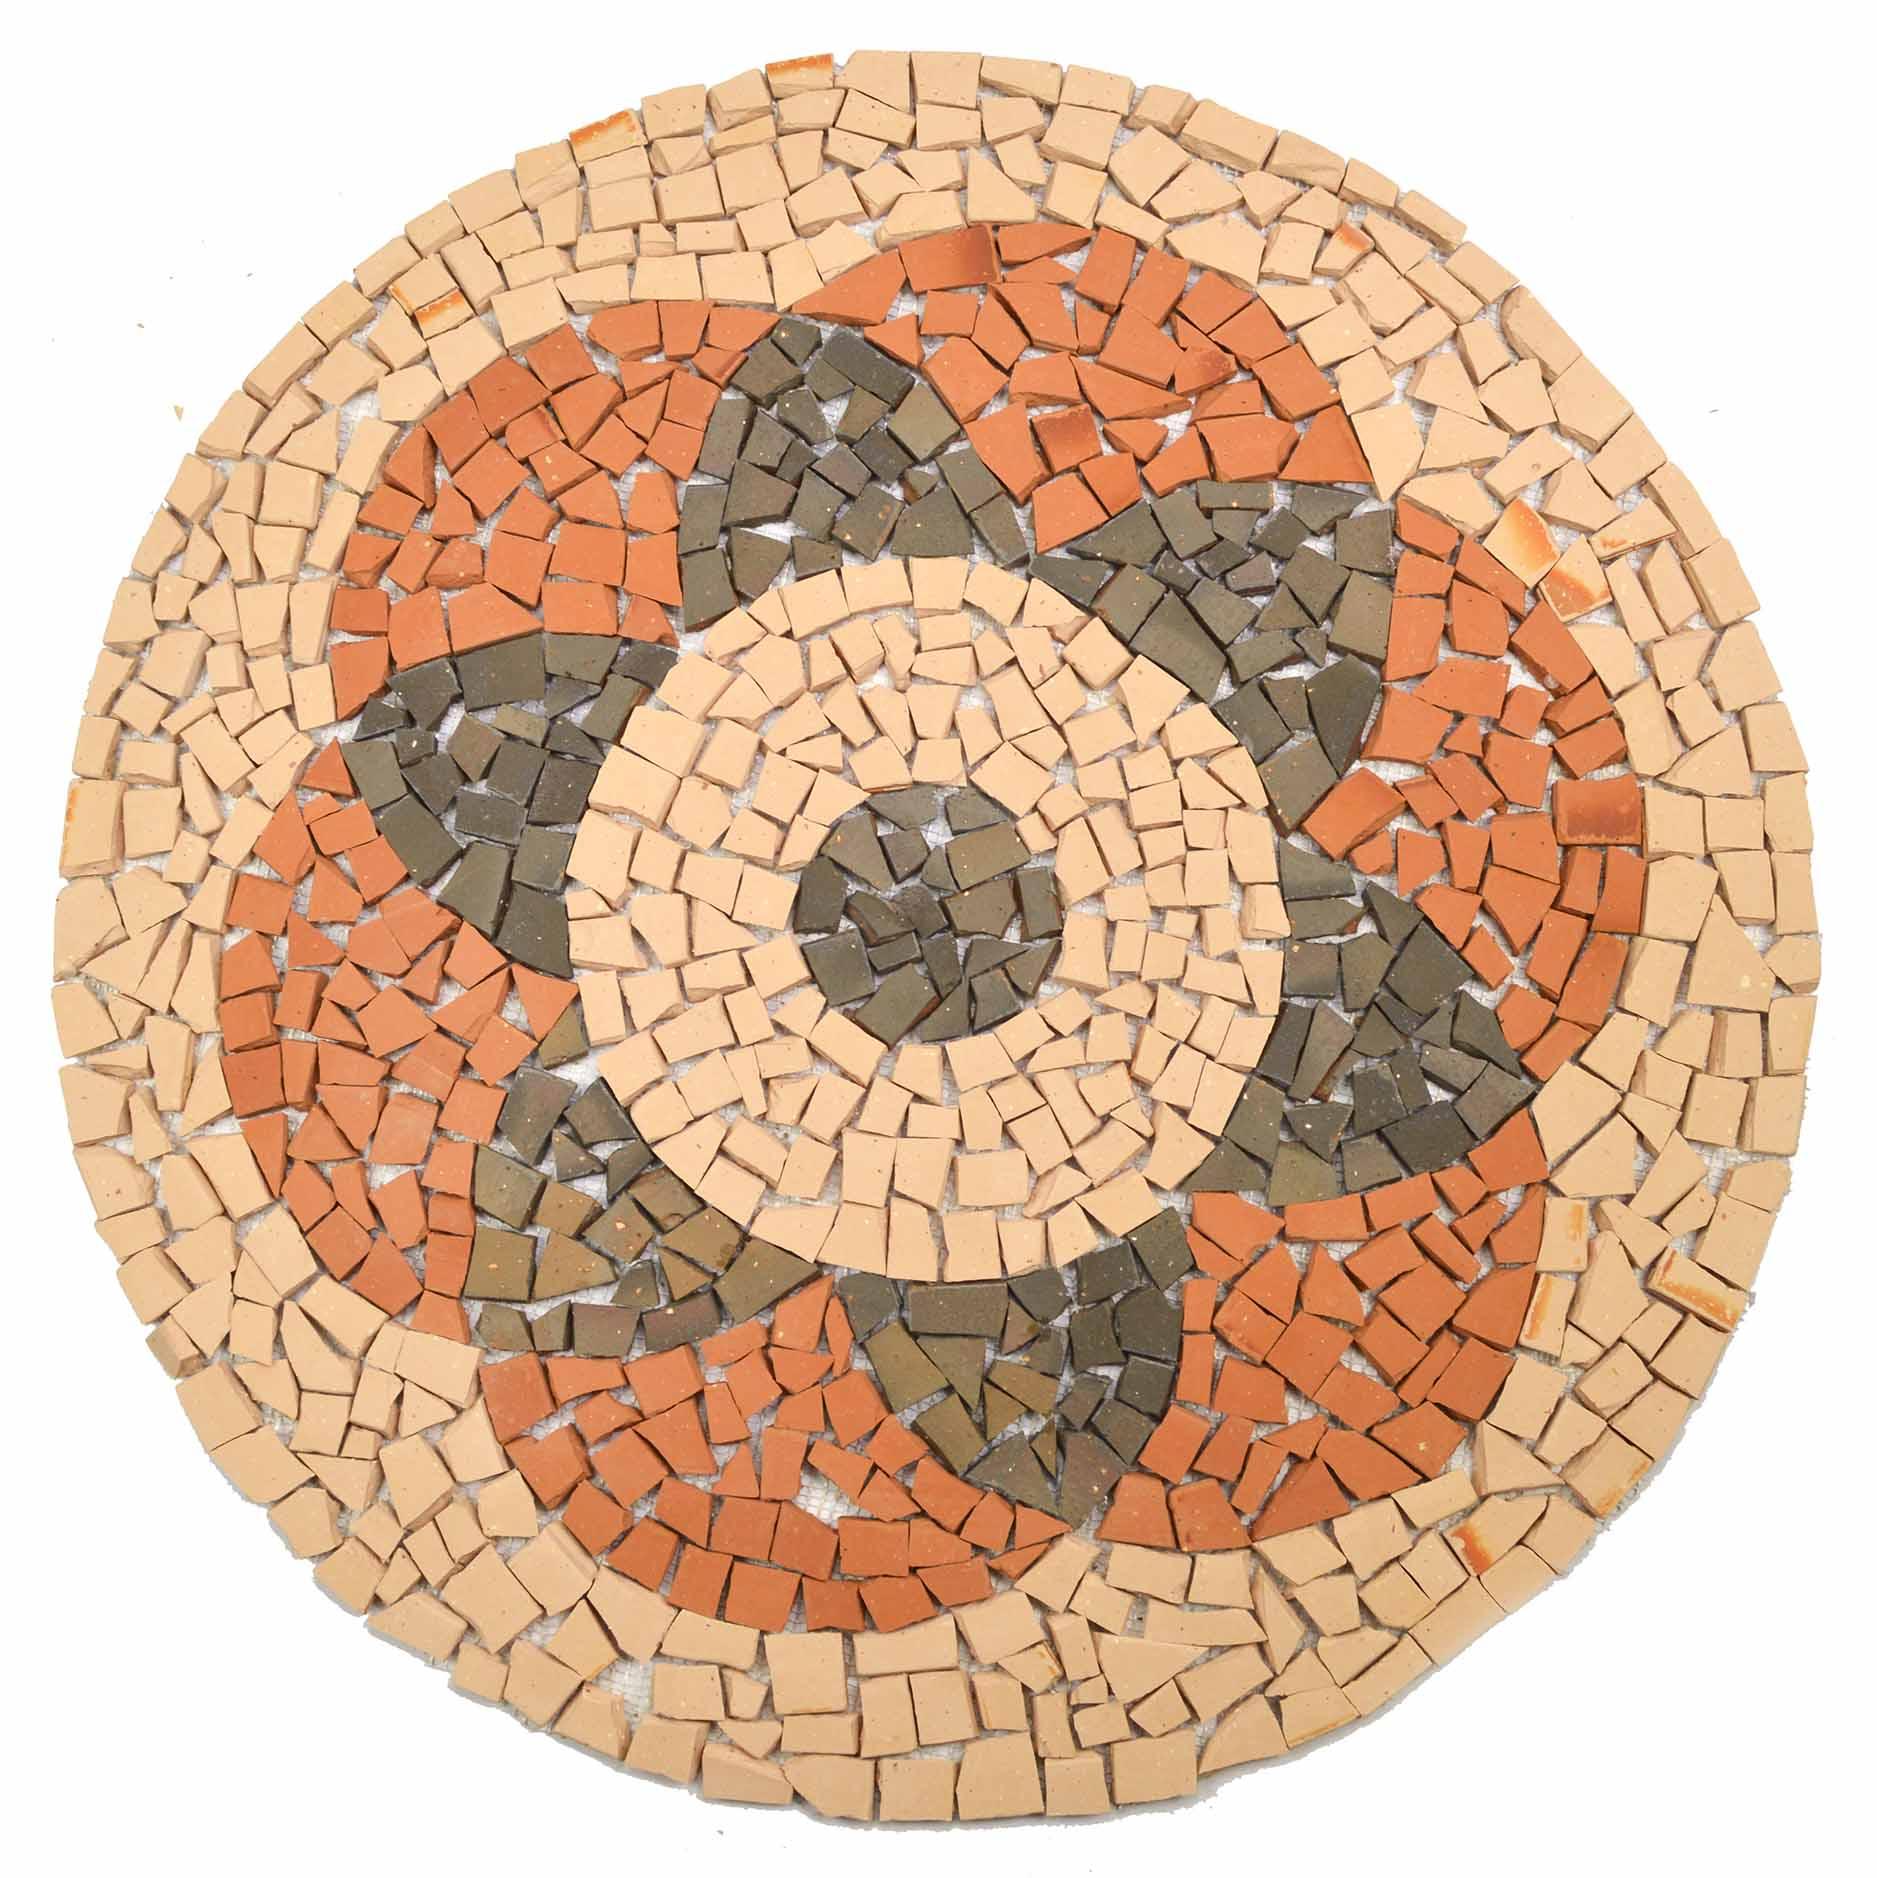 Rosone Círculos - A partir de 0,80 - 3 Tamanhos - Nina Martinelli